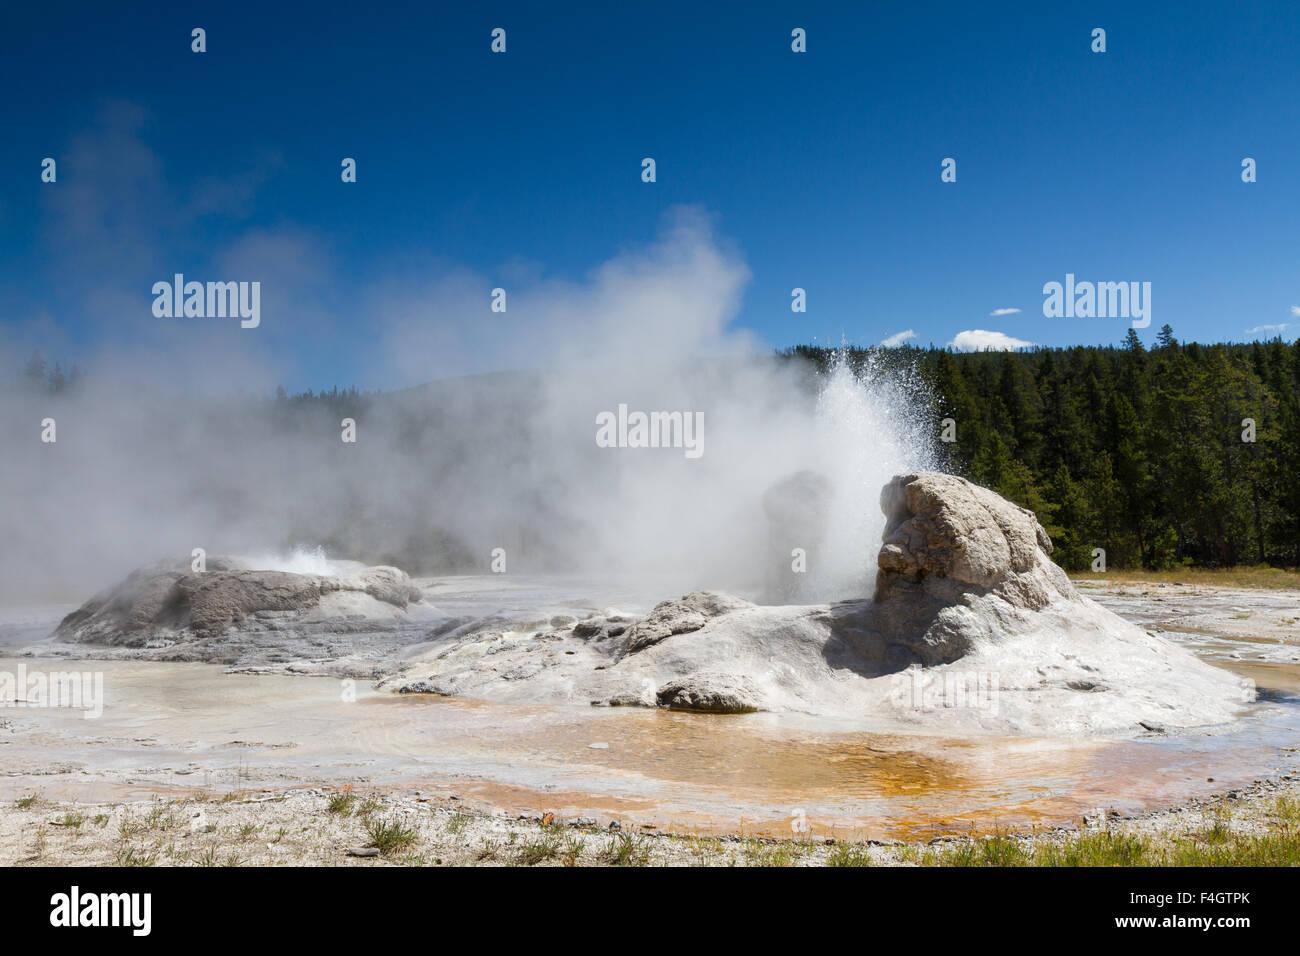 Eruption of Grotto Geyser, Yellowstone National Park, Wyoming, USA - Stock Image